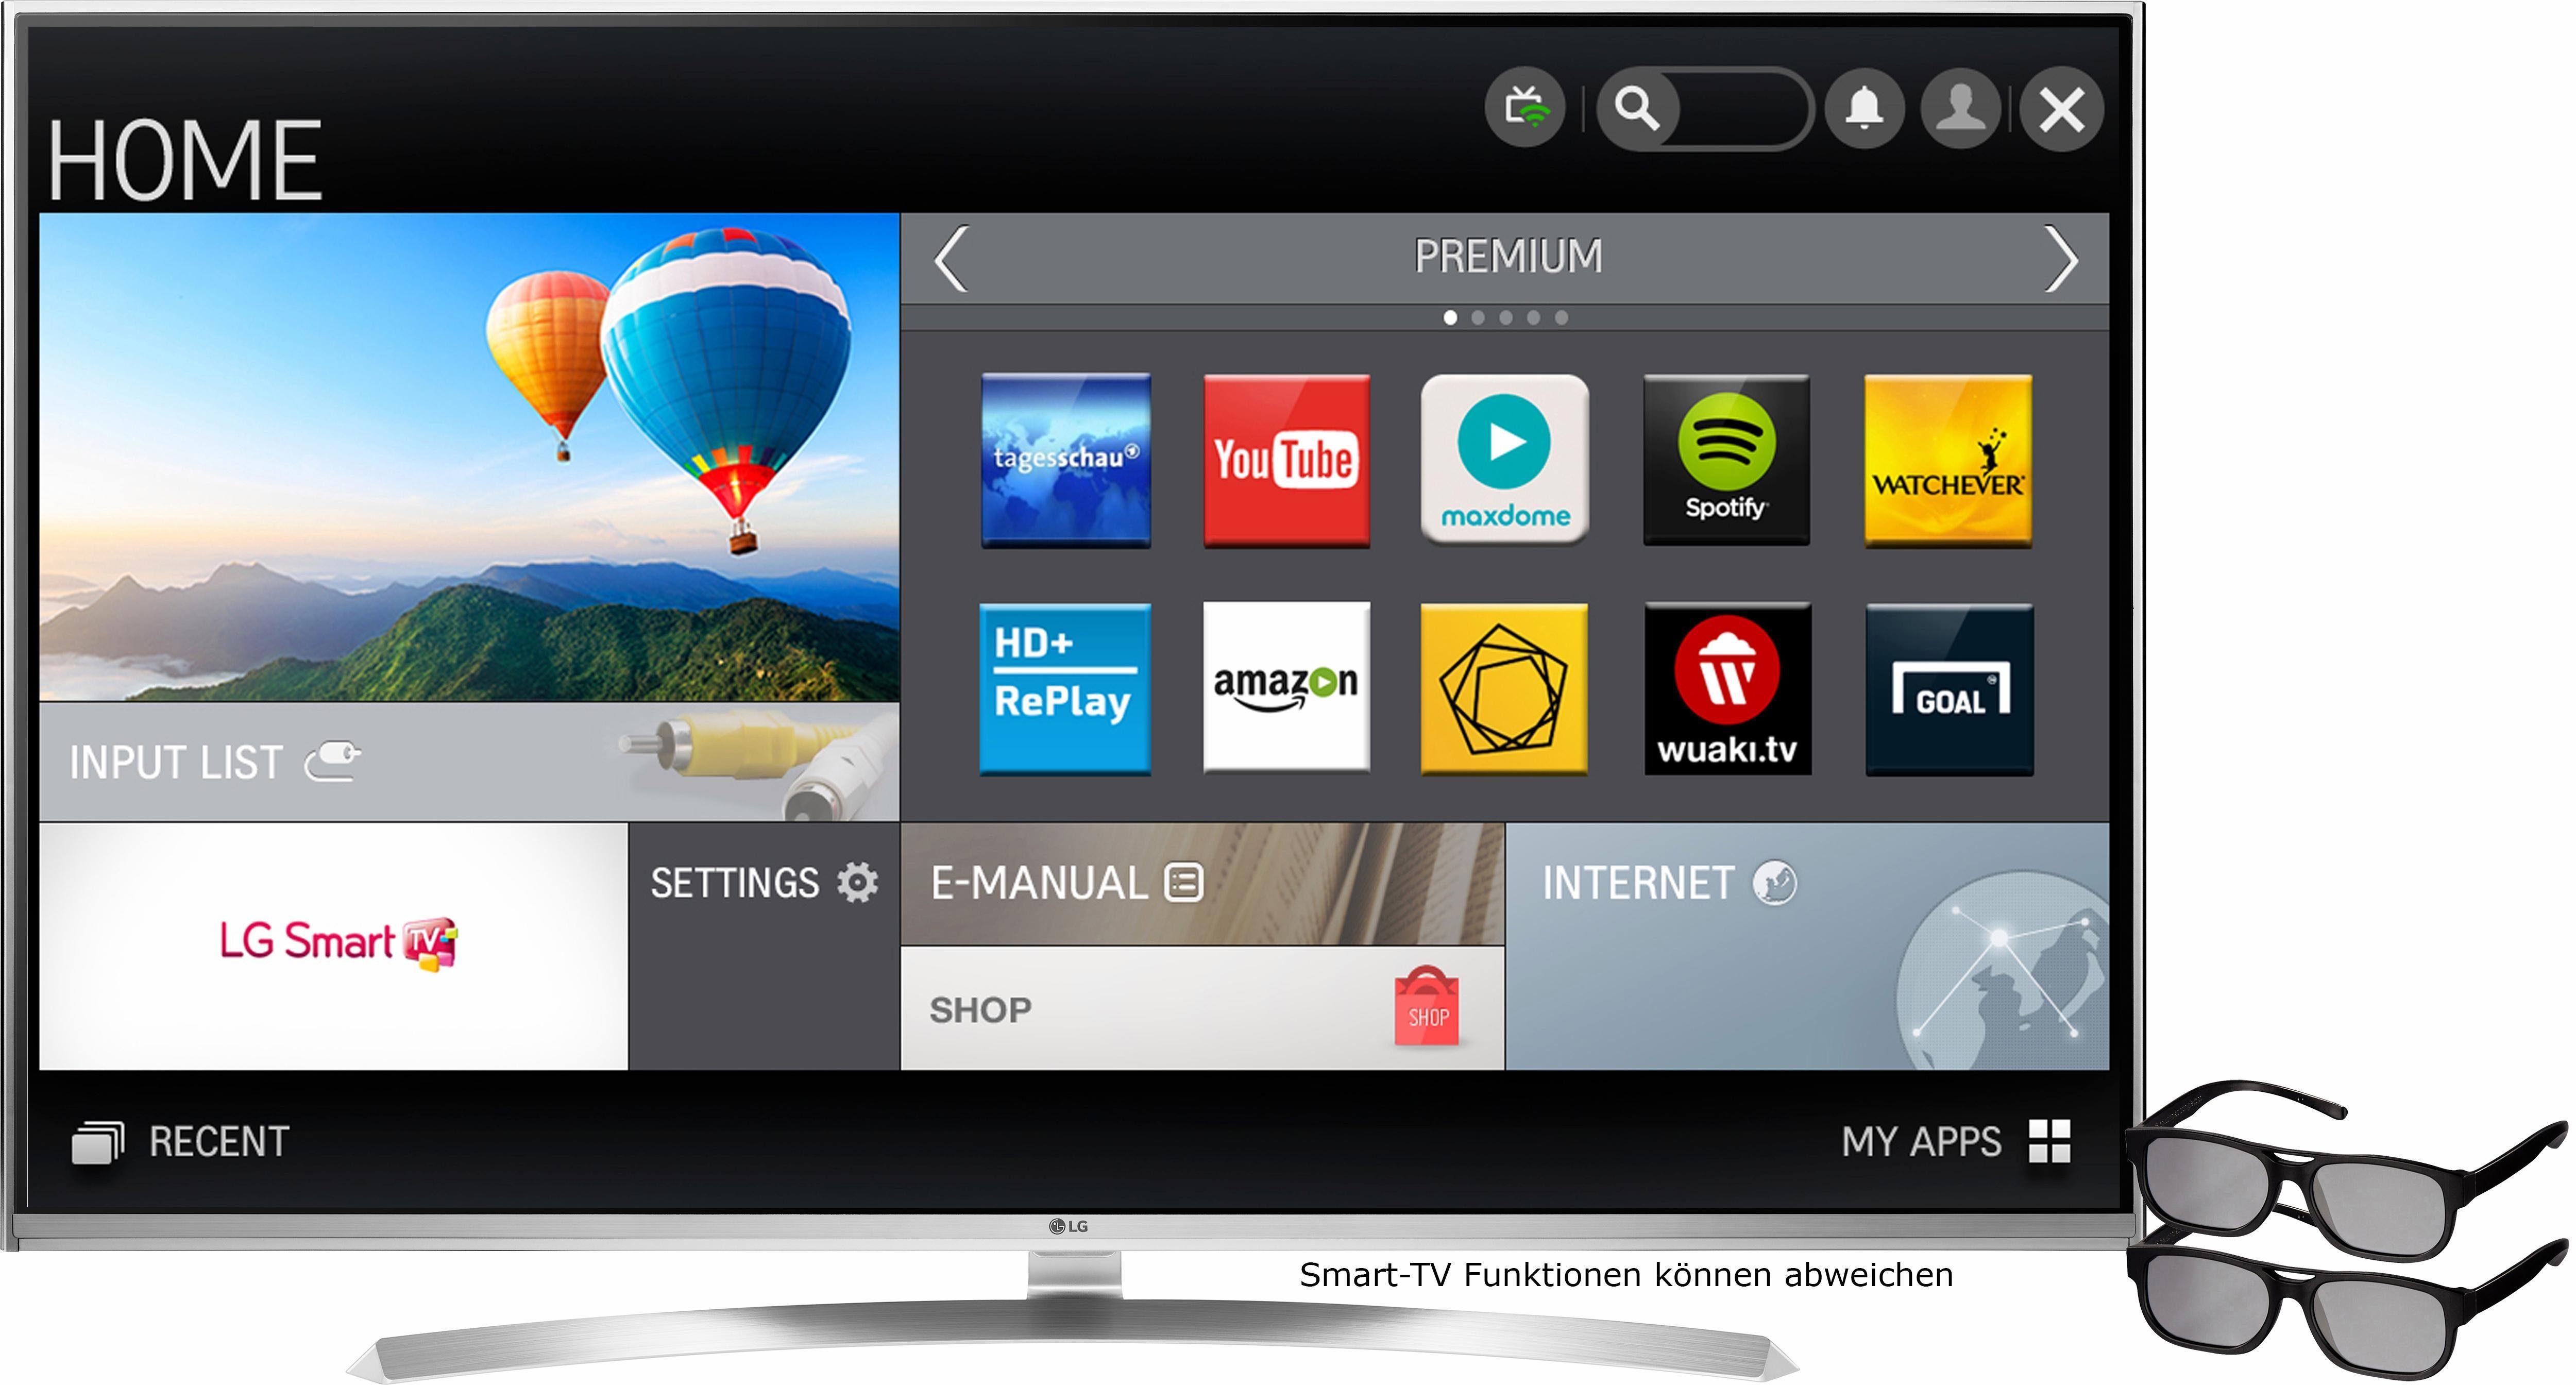 LG 60UH8509, LED Fernseher, 151 cm (60 Zoll), 2160p (4K Ultra HD), Smart-TV